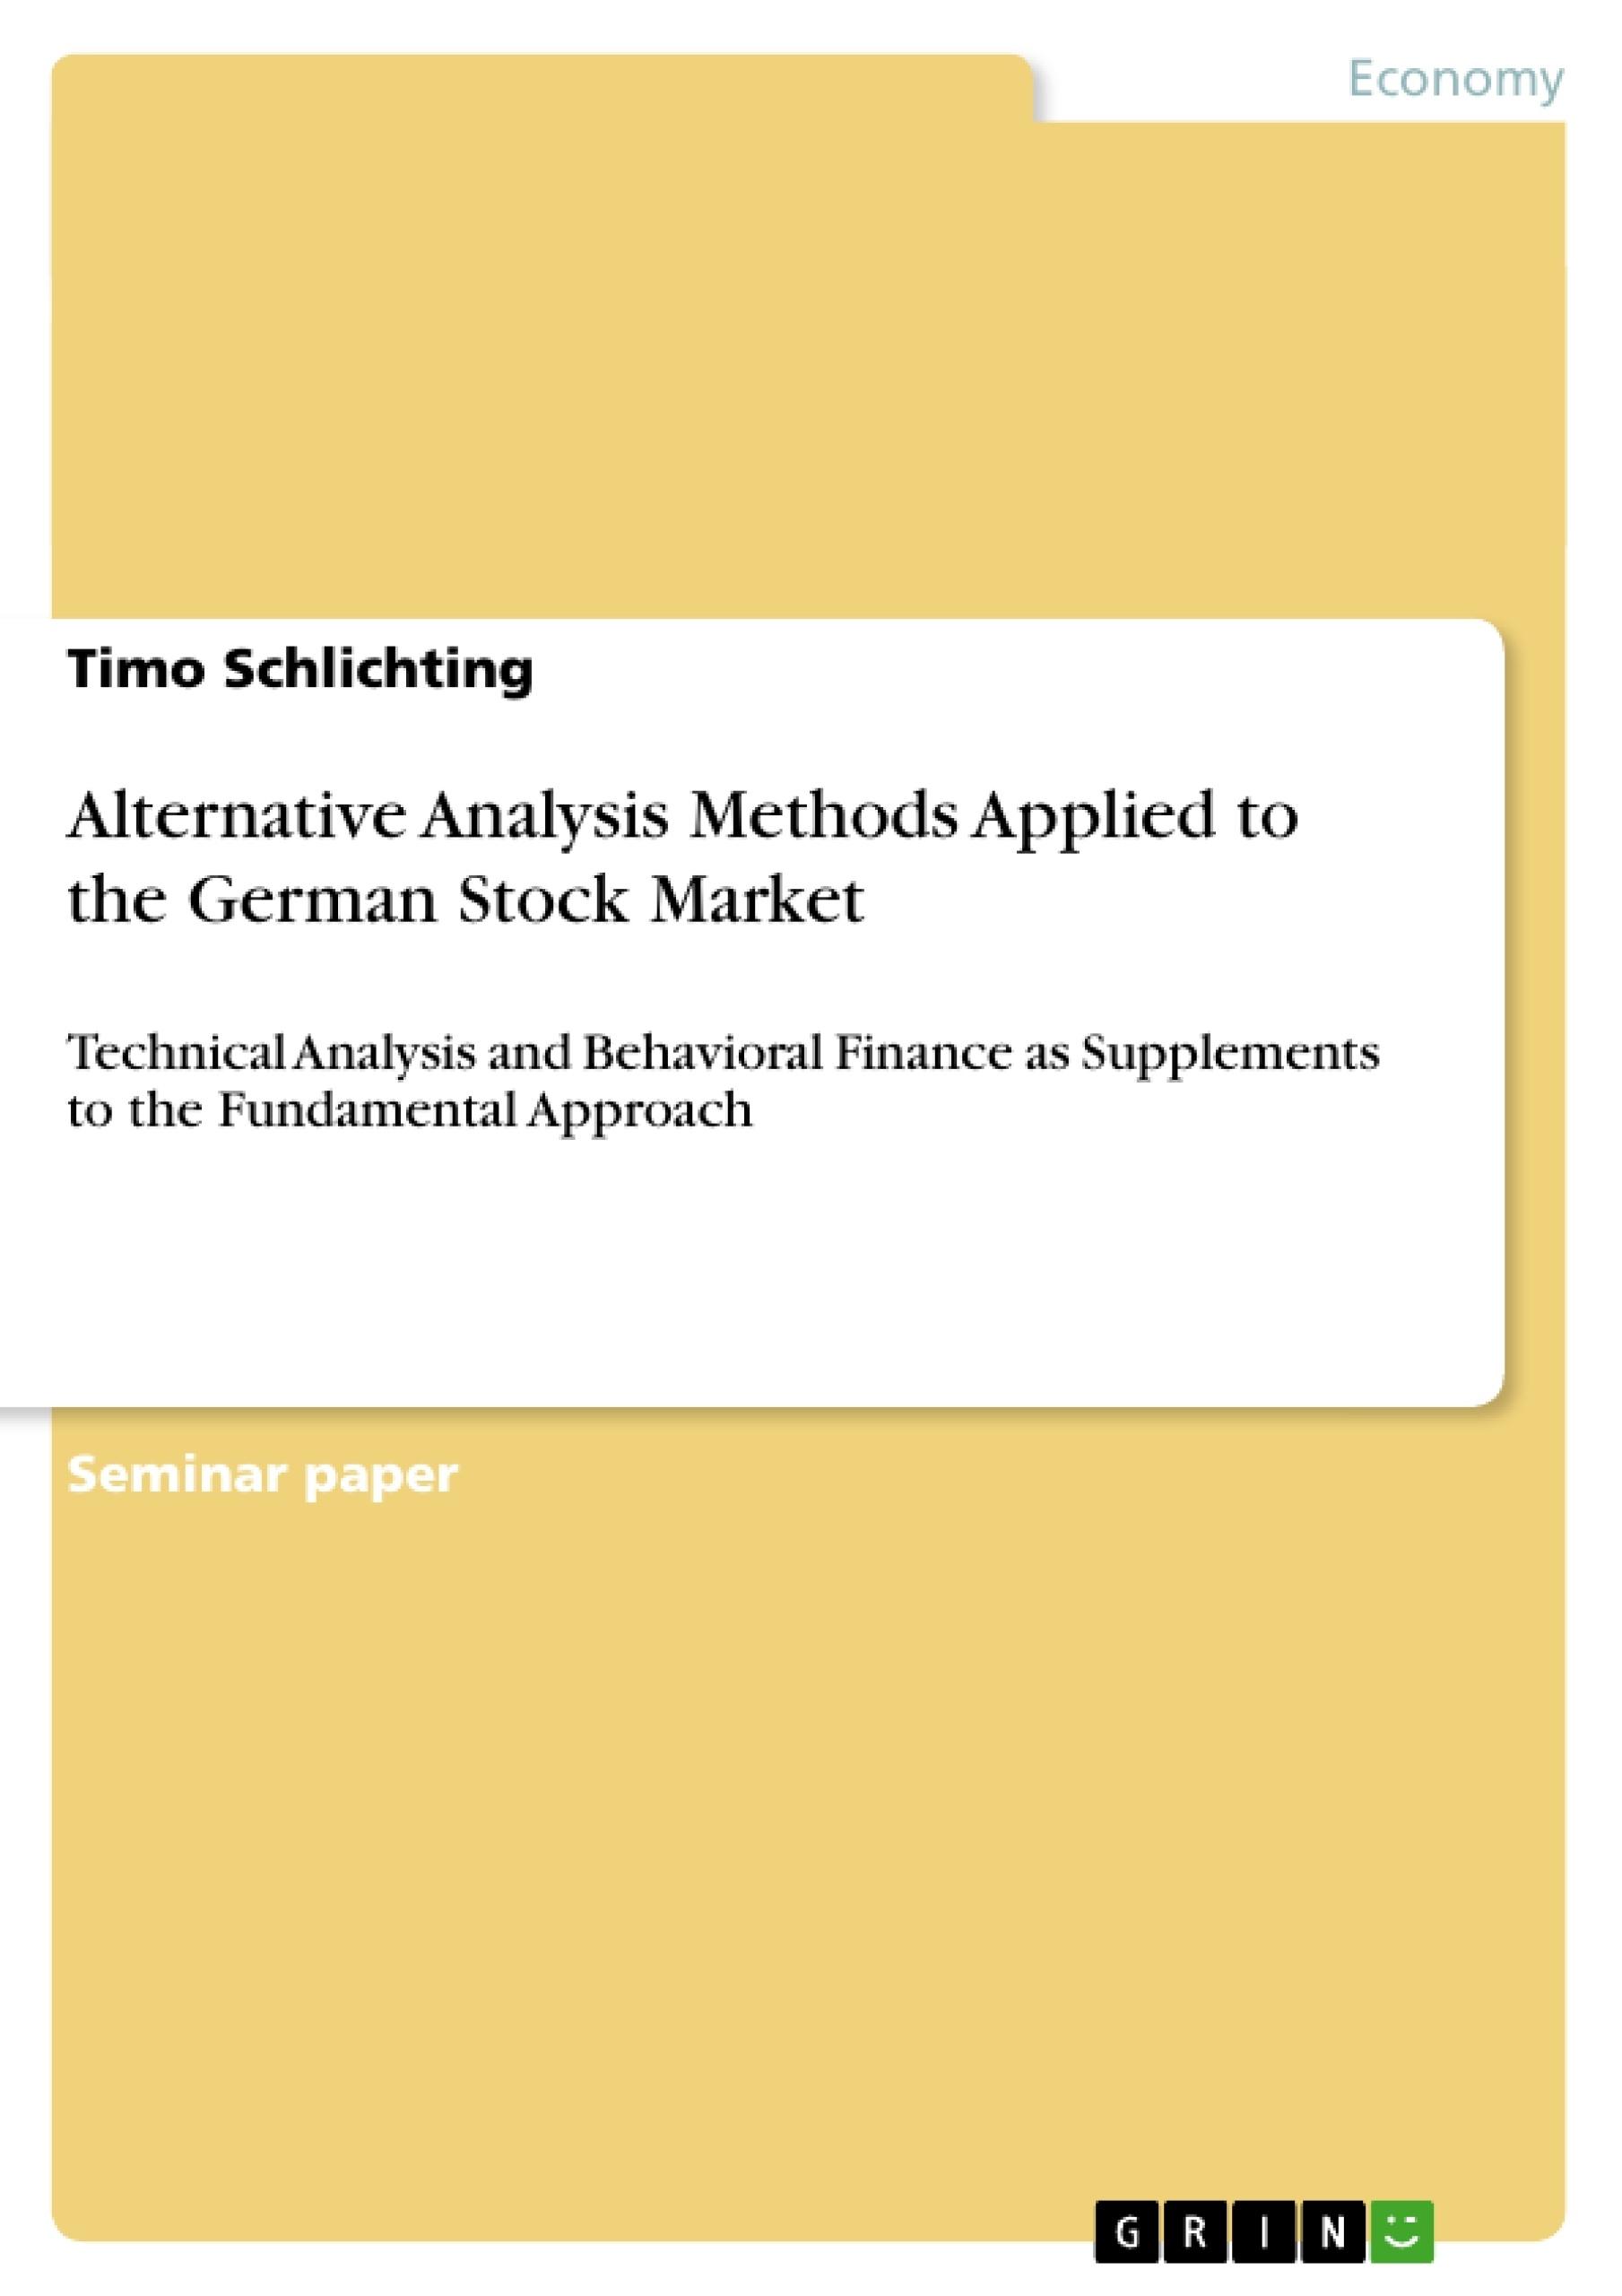 Title: Alternative Analysis Methods Applied to the German Stock Market